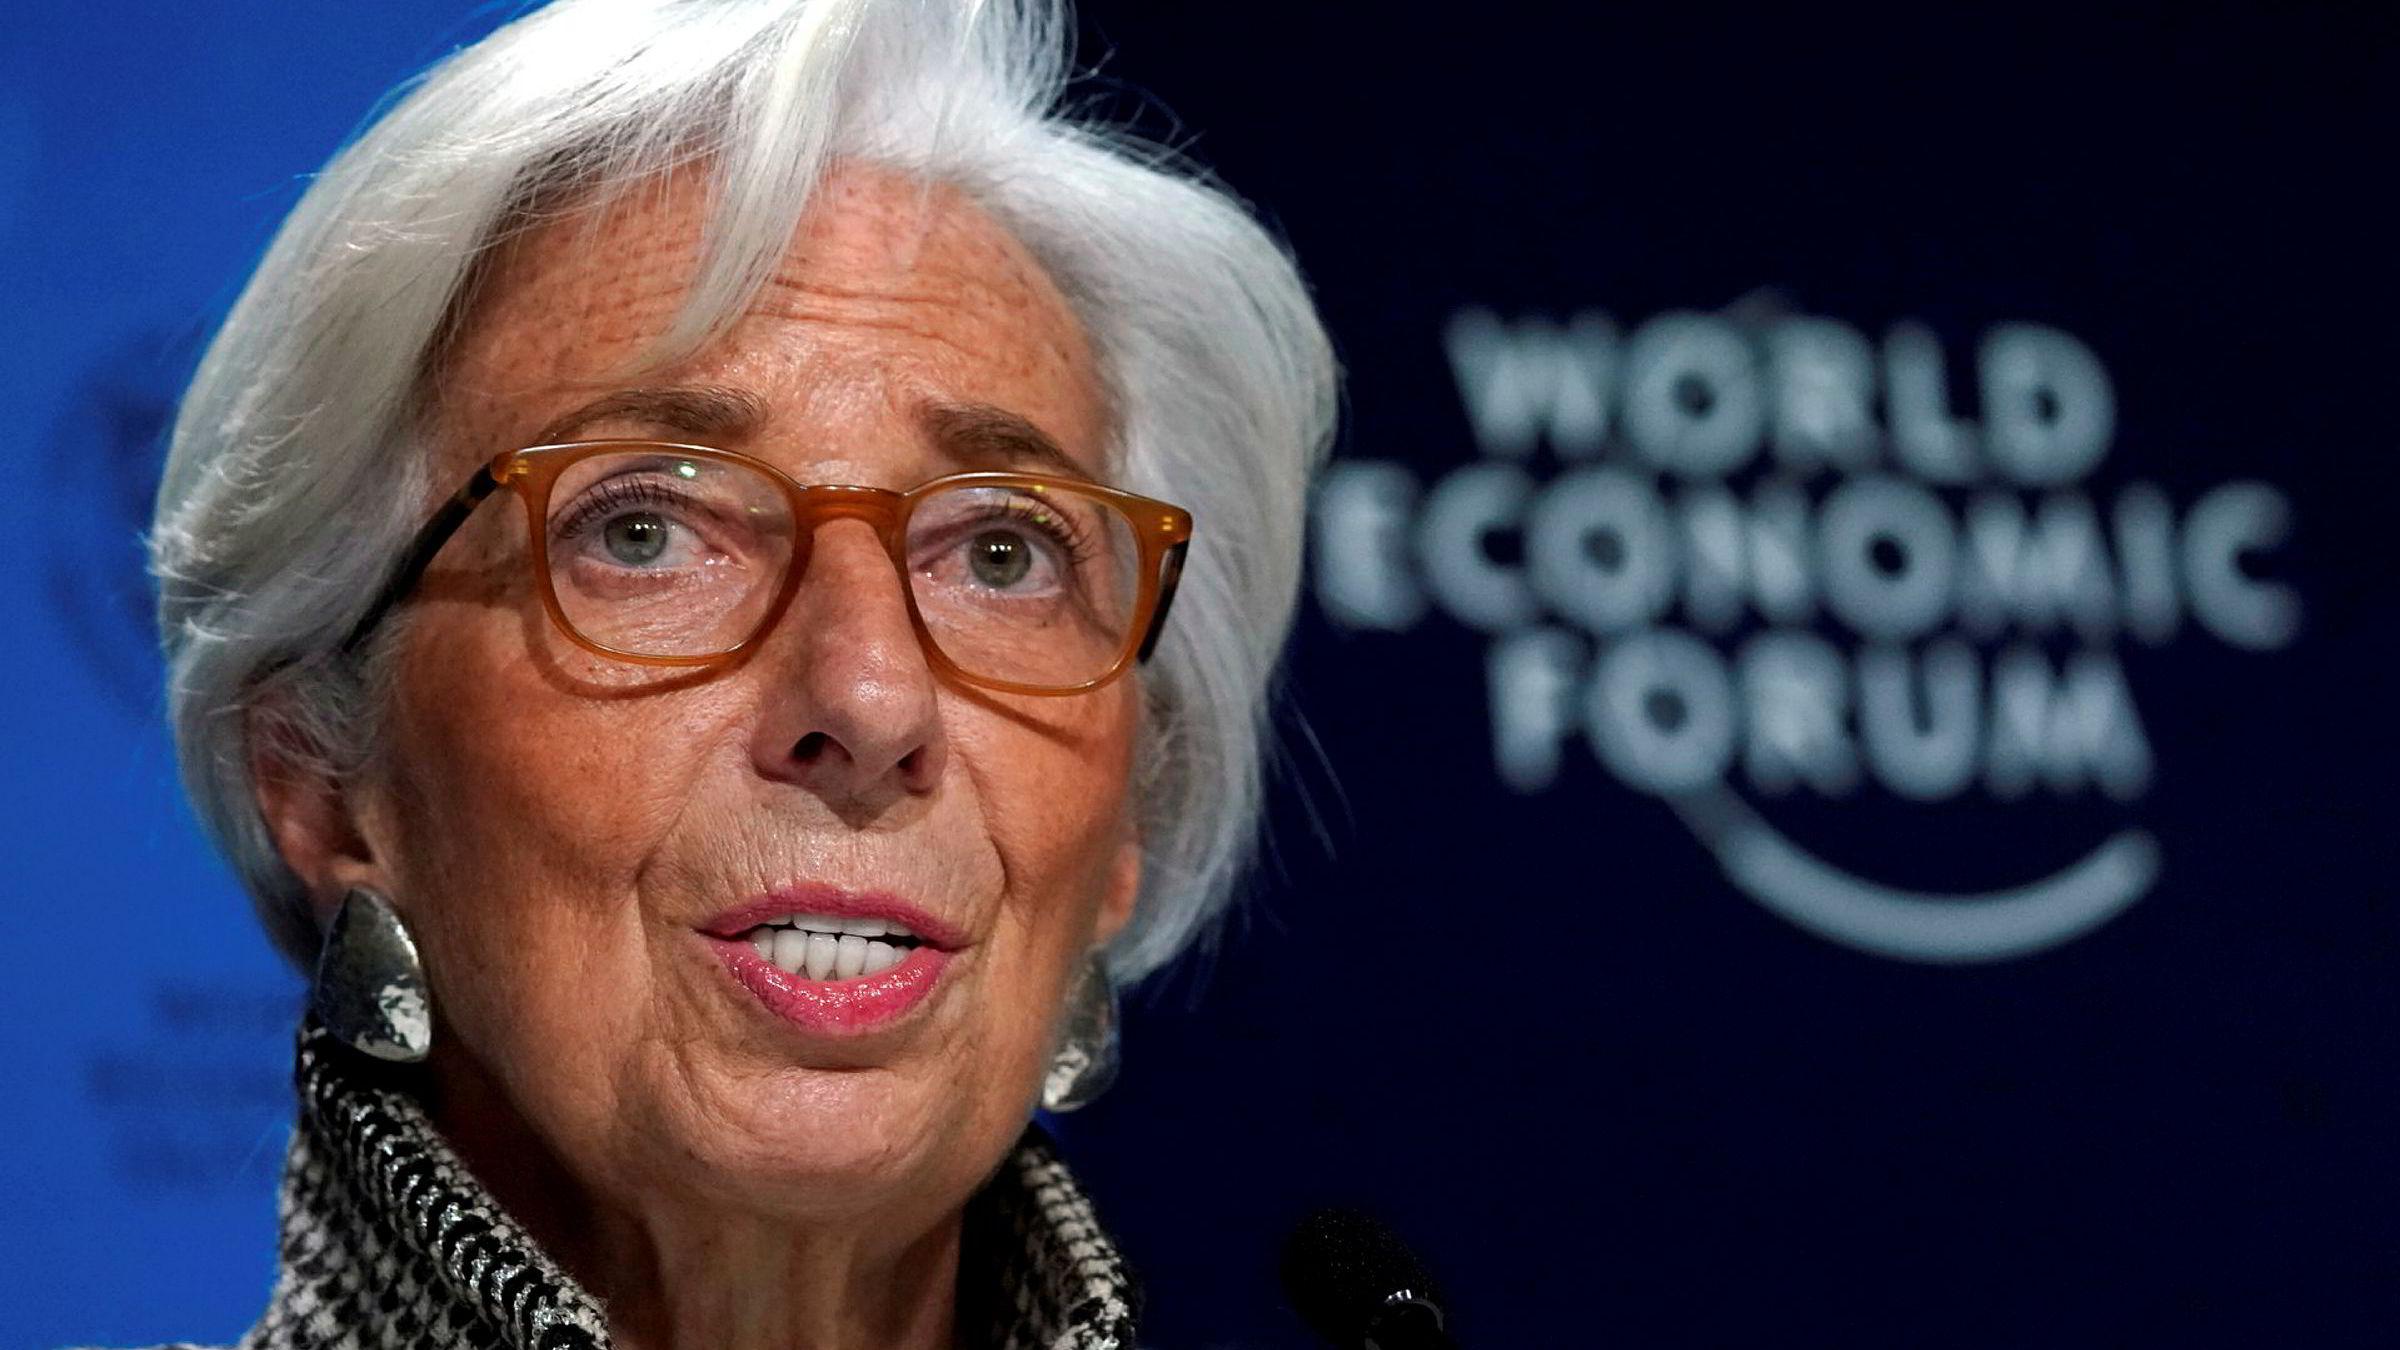 IMF-sjef Christine Lagarde holdt pressekonferanse under World Economic Forum i Davos i Sveits mandag kveld.